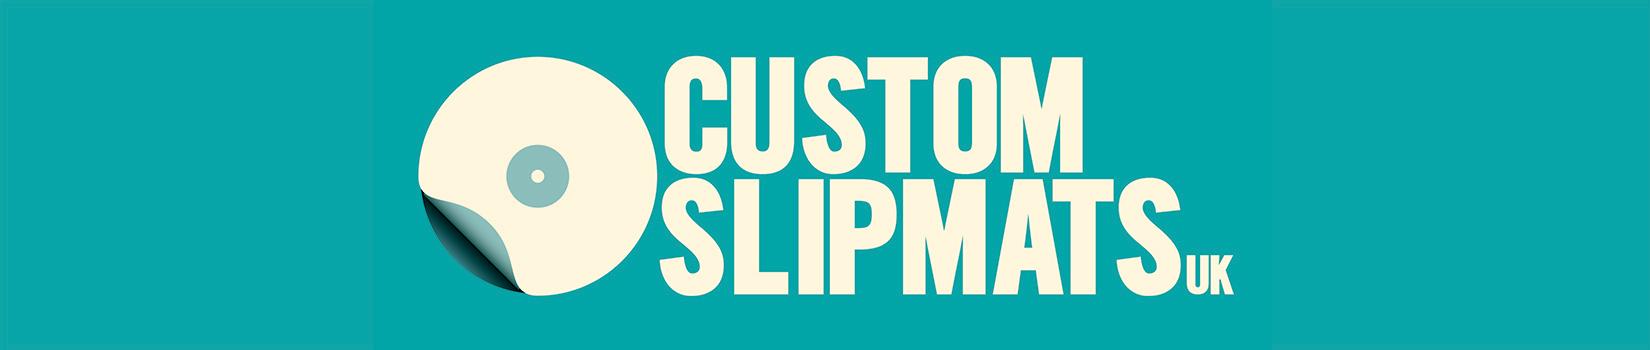 Custom Slipmats